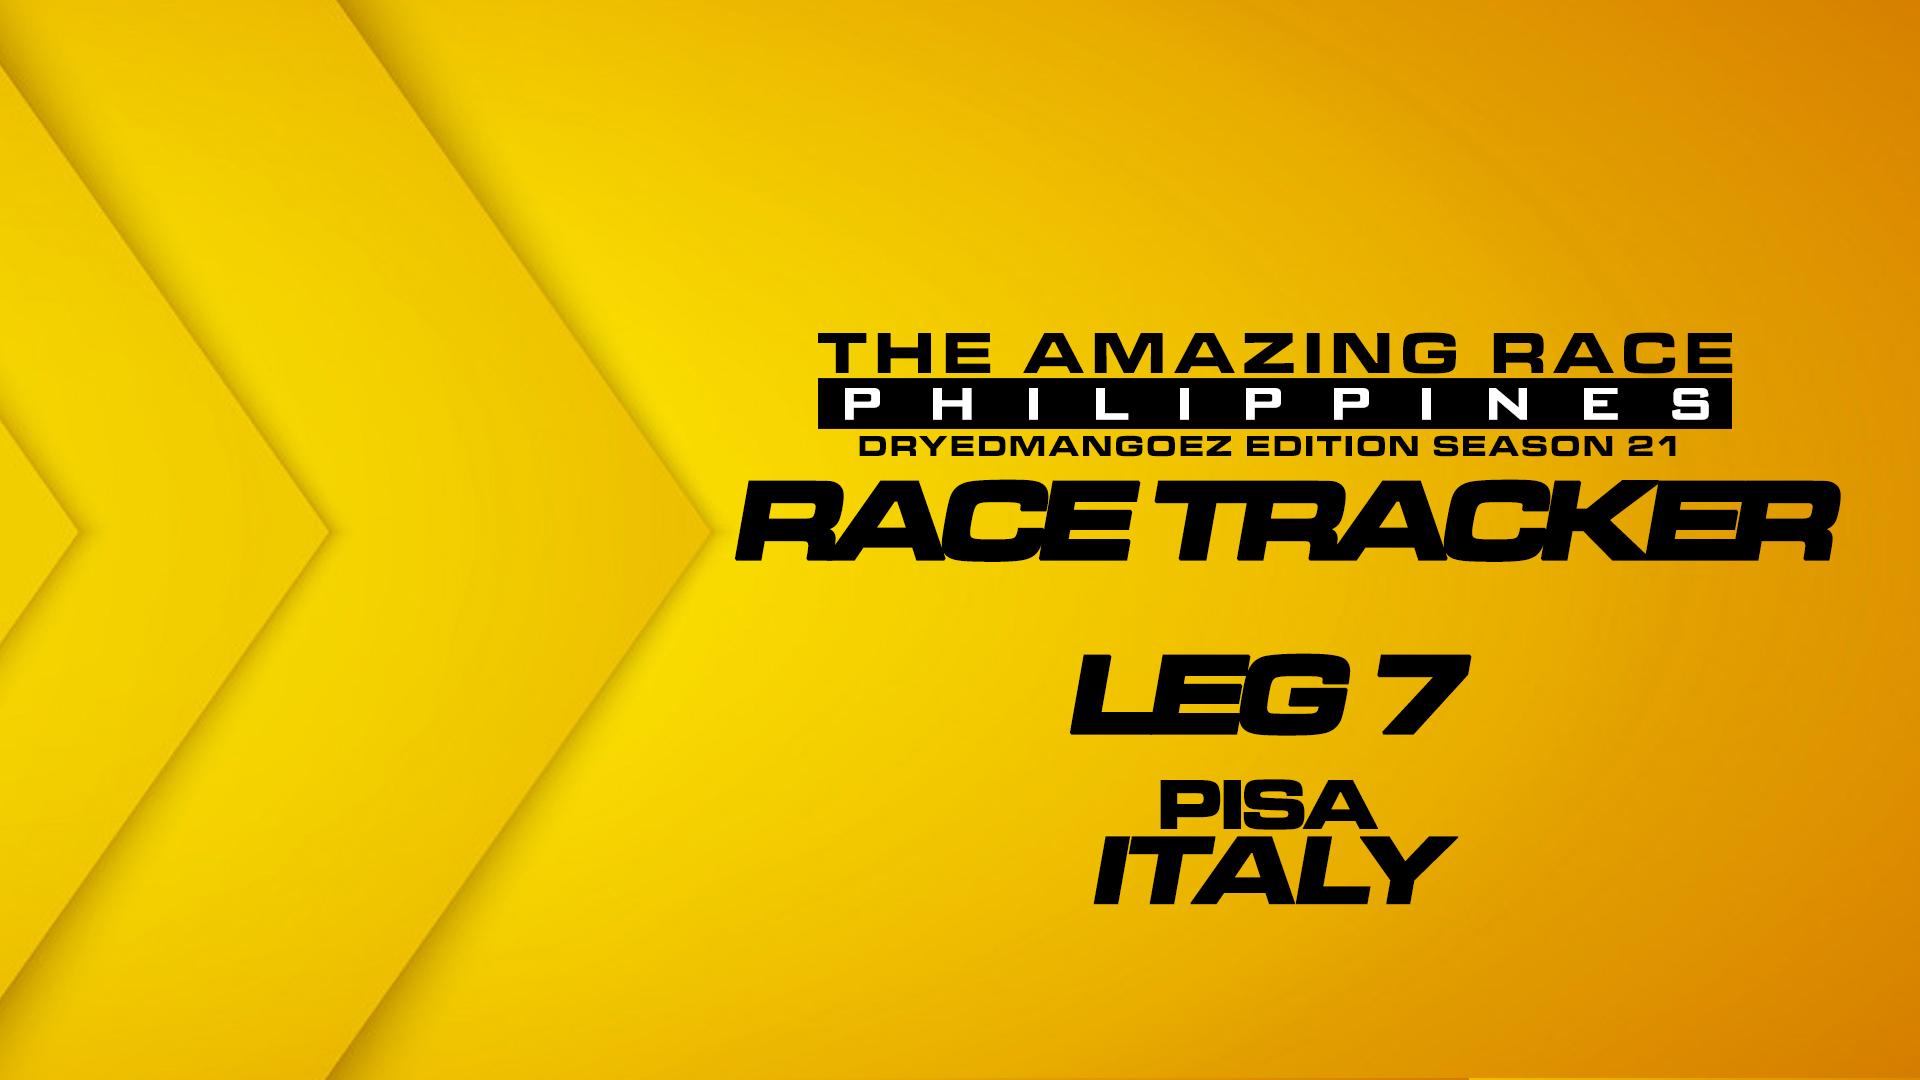 The Amazing Race Philippines: DryedMangoez Edition Season 21 Race Tracker – Leg 7